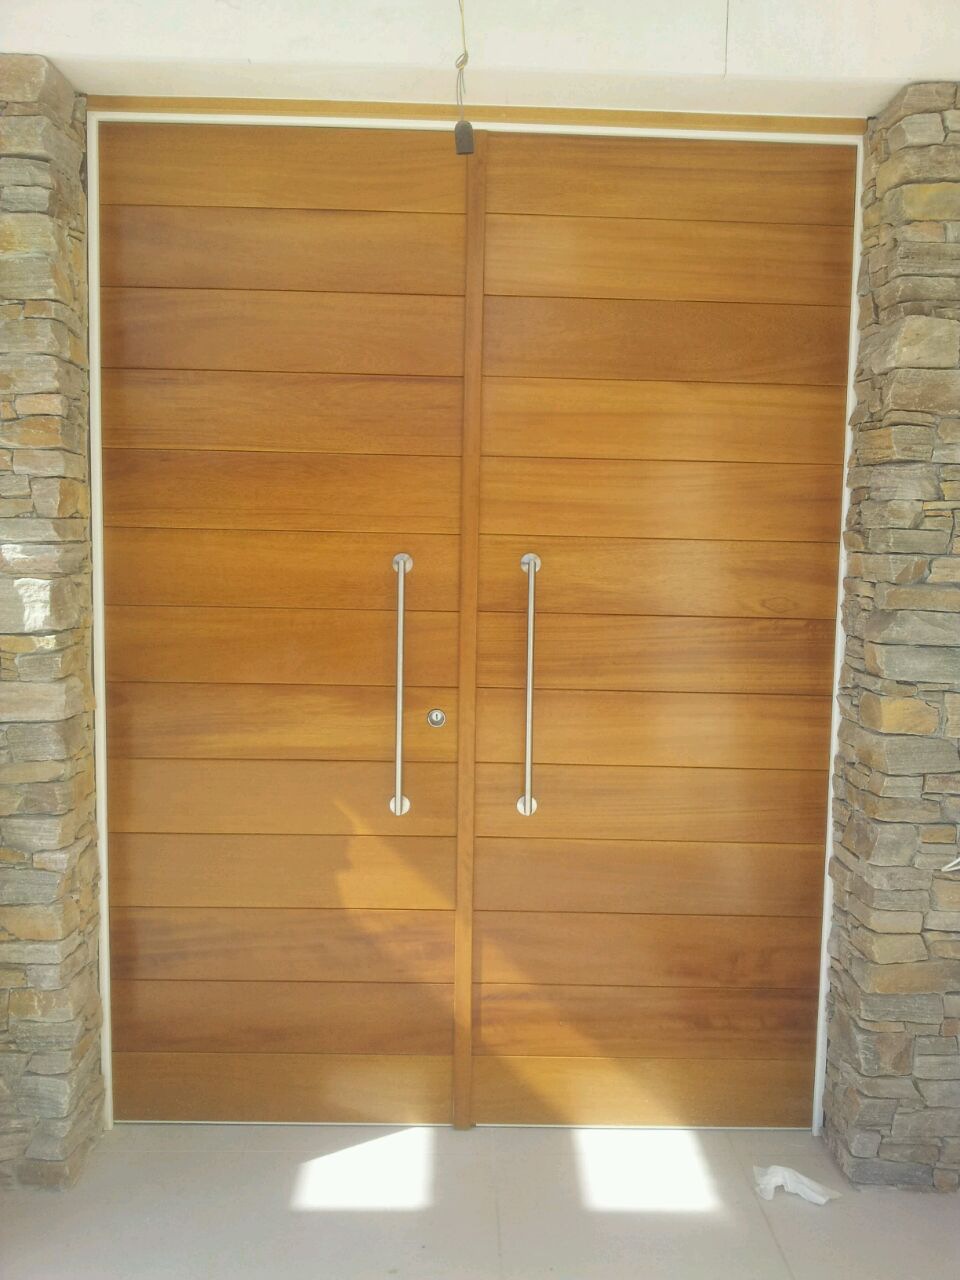 Puerta Acorazada Doble Hoja.